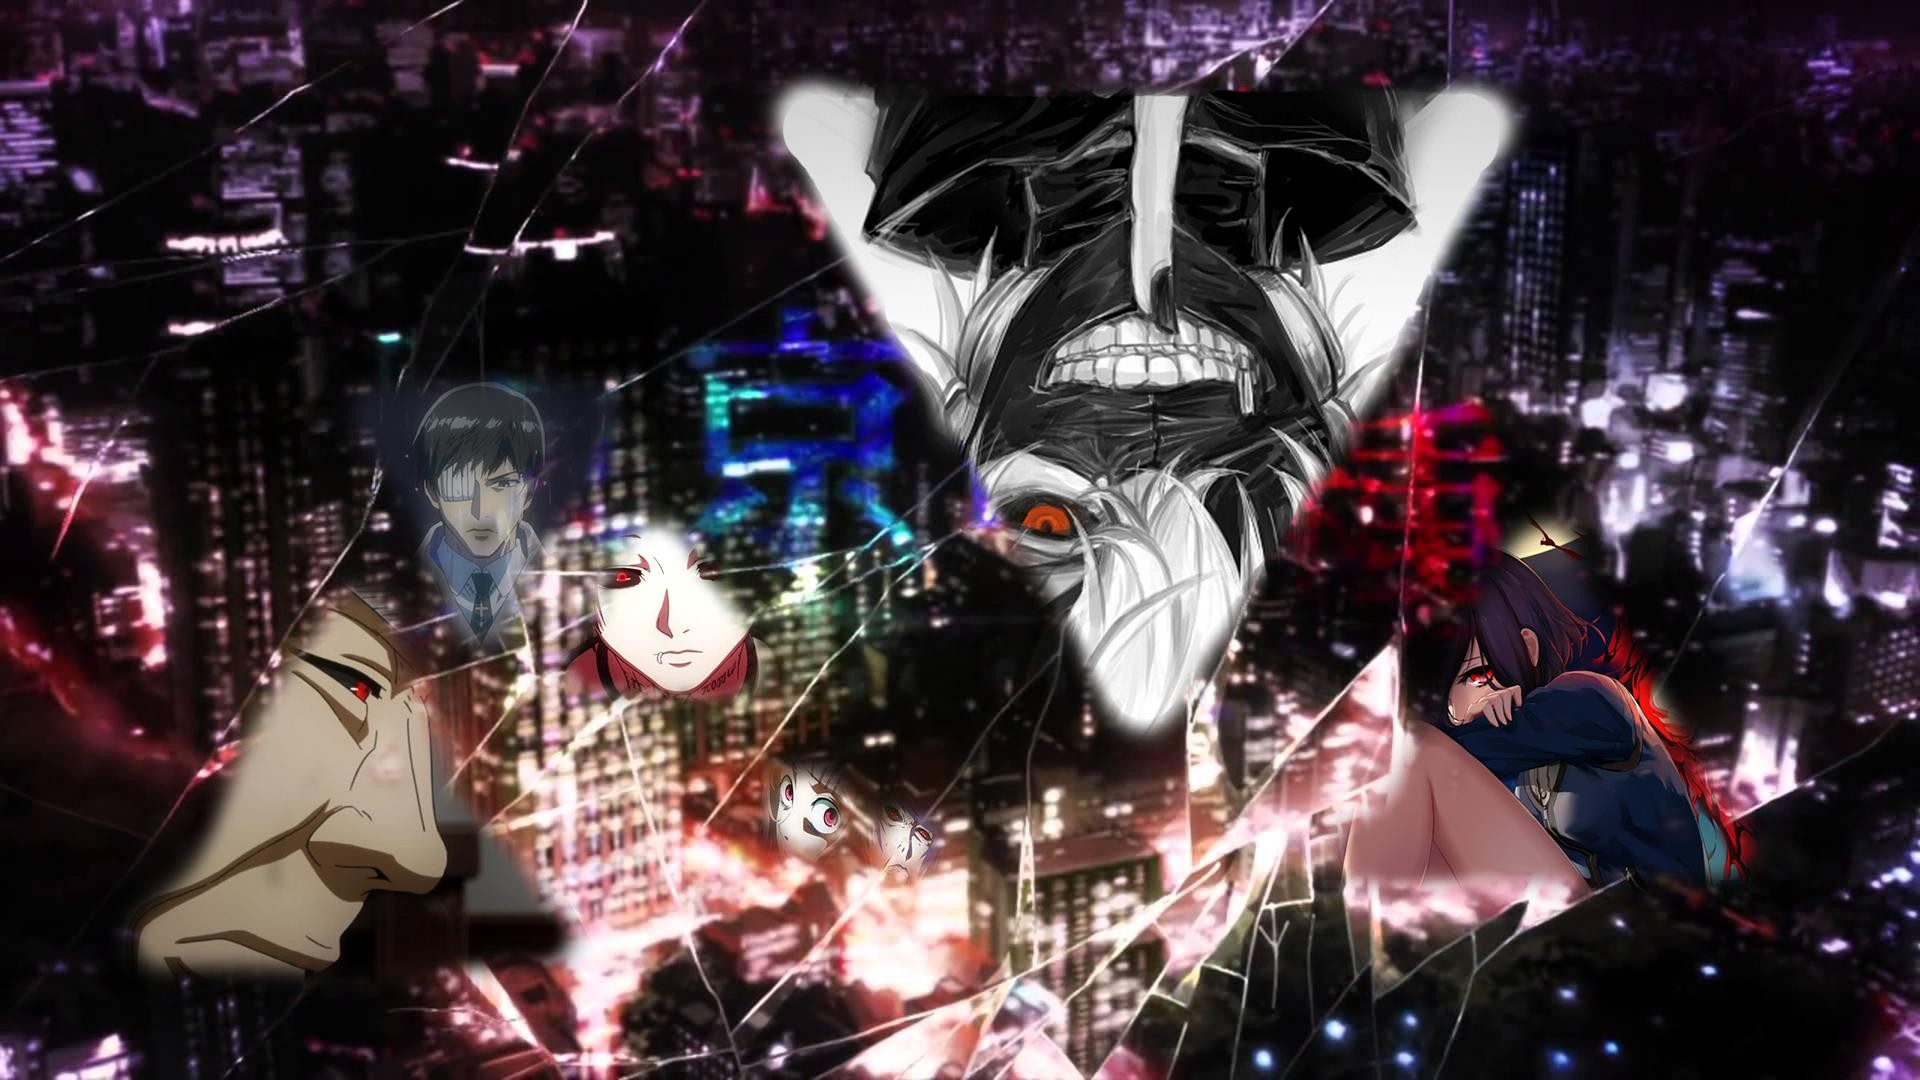 Wallpaper Tokyo Ghoul Re Iphone